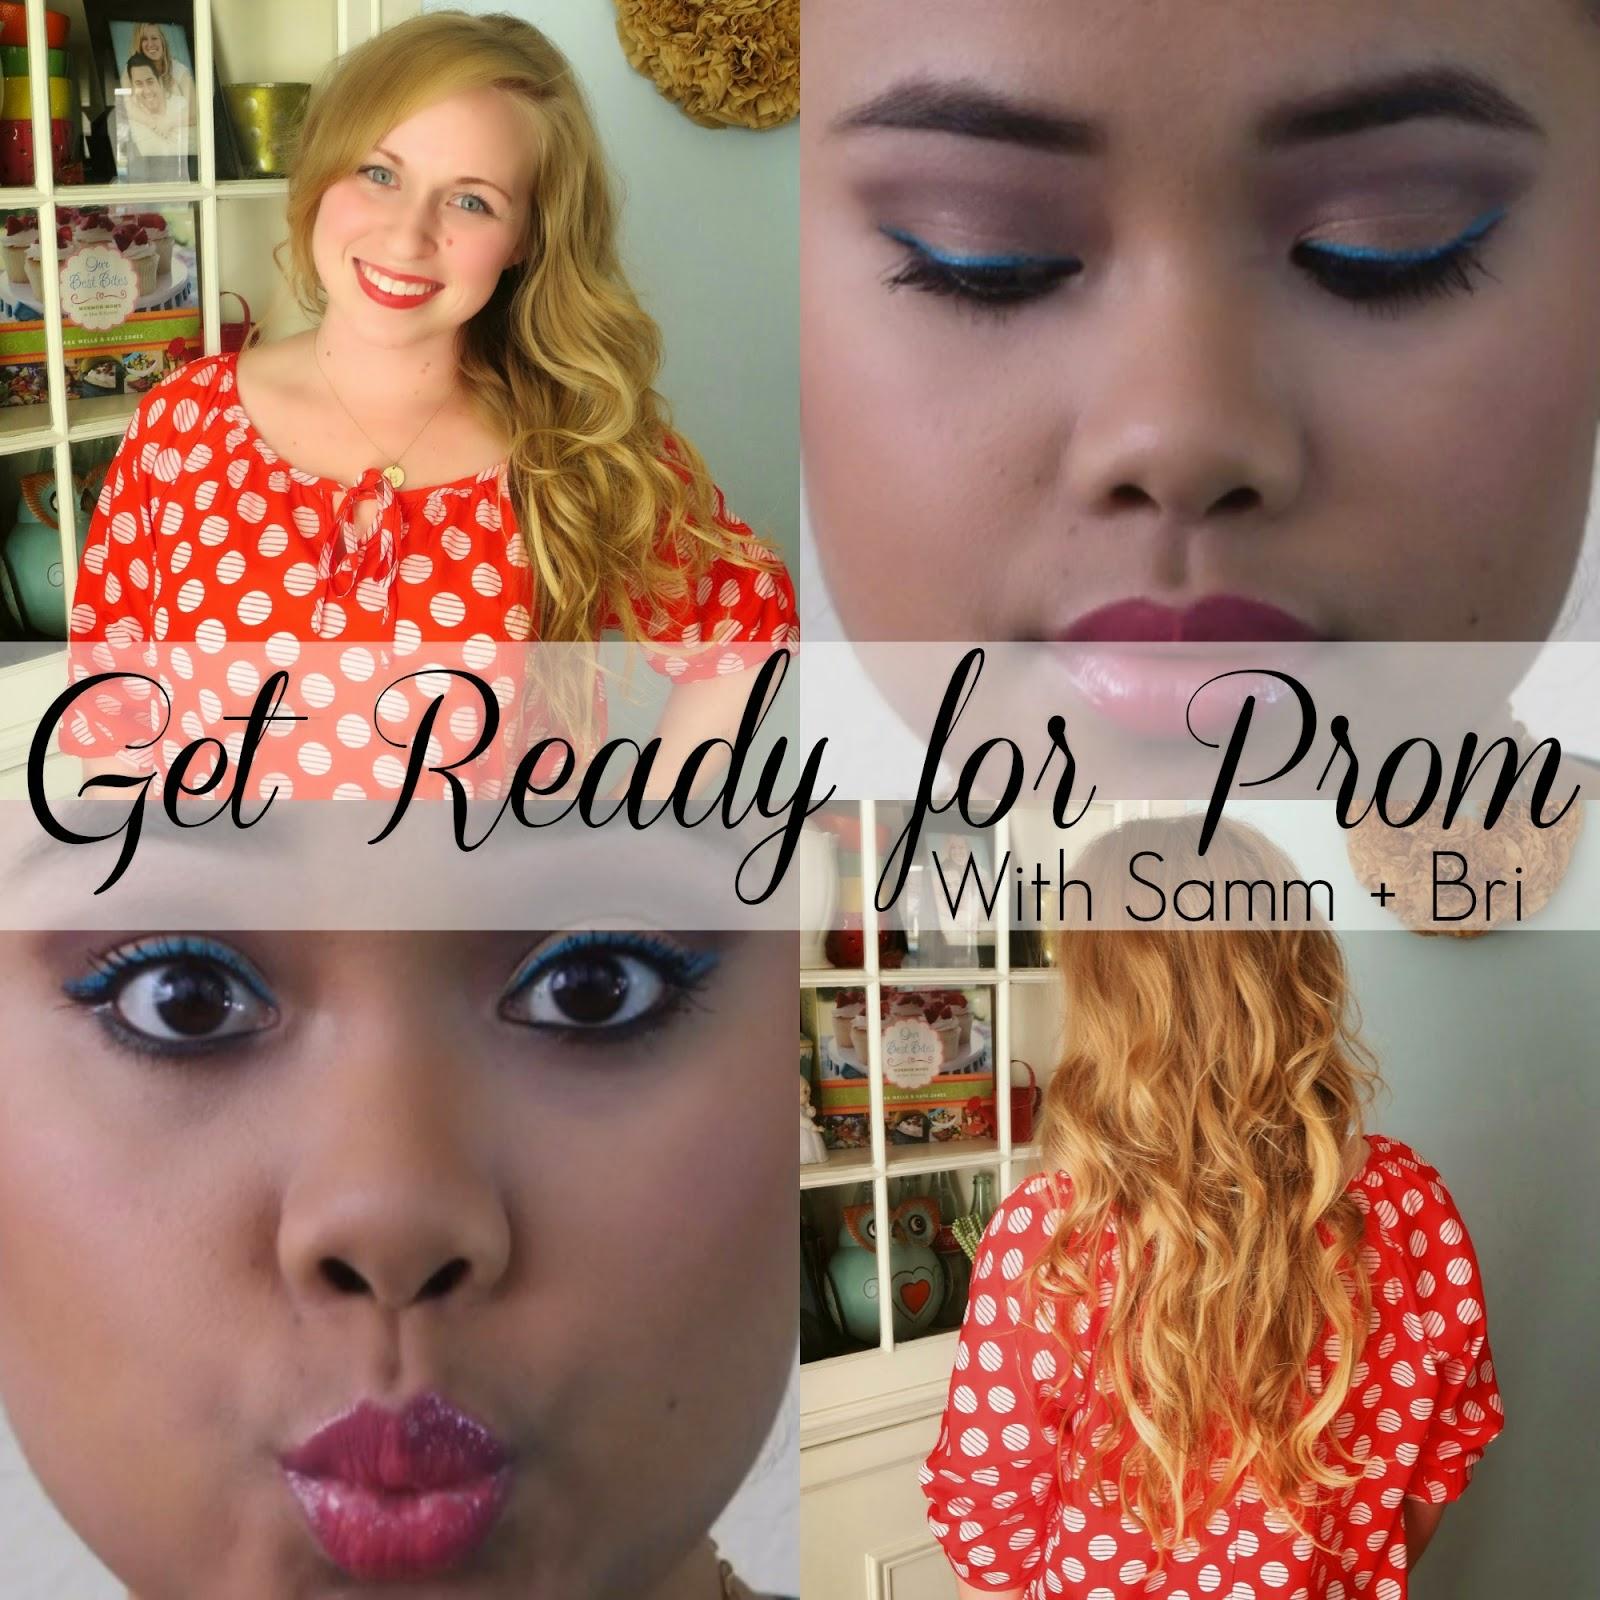 Breezy Days Get Ready For Prom With Samm Bri